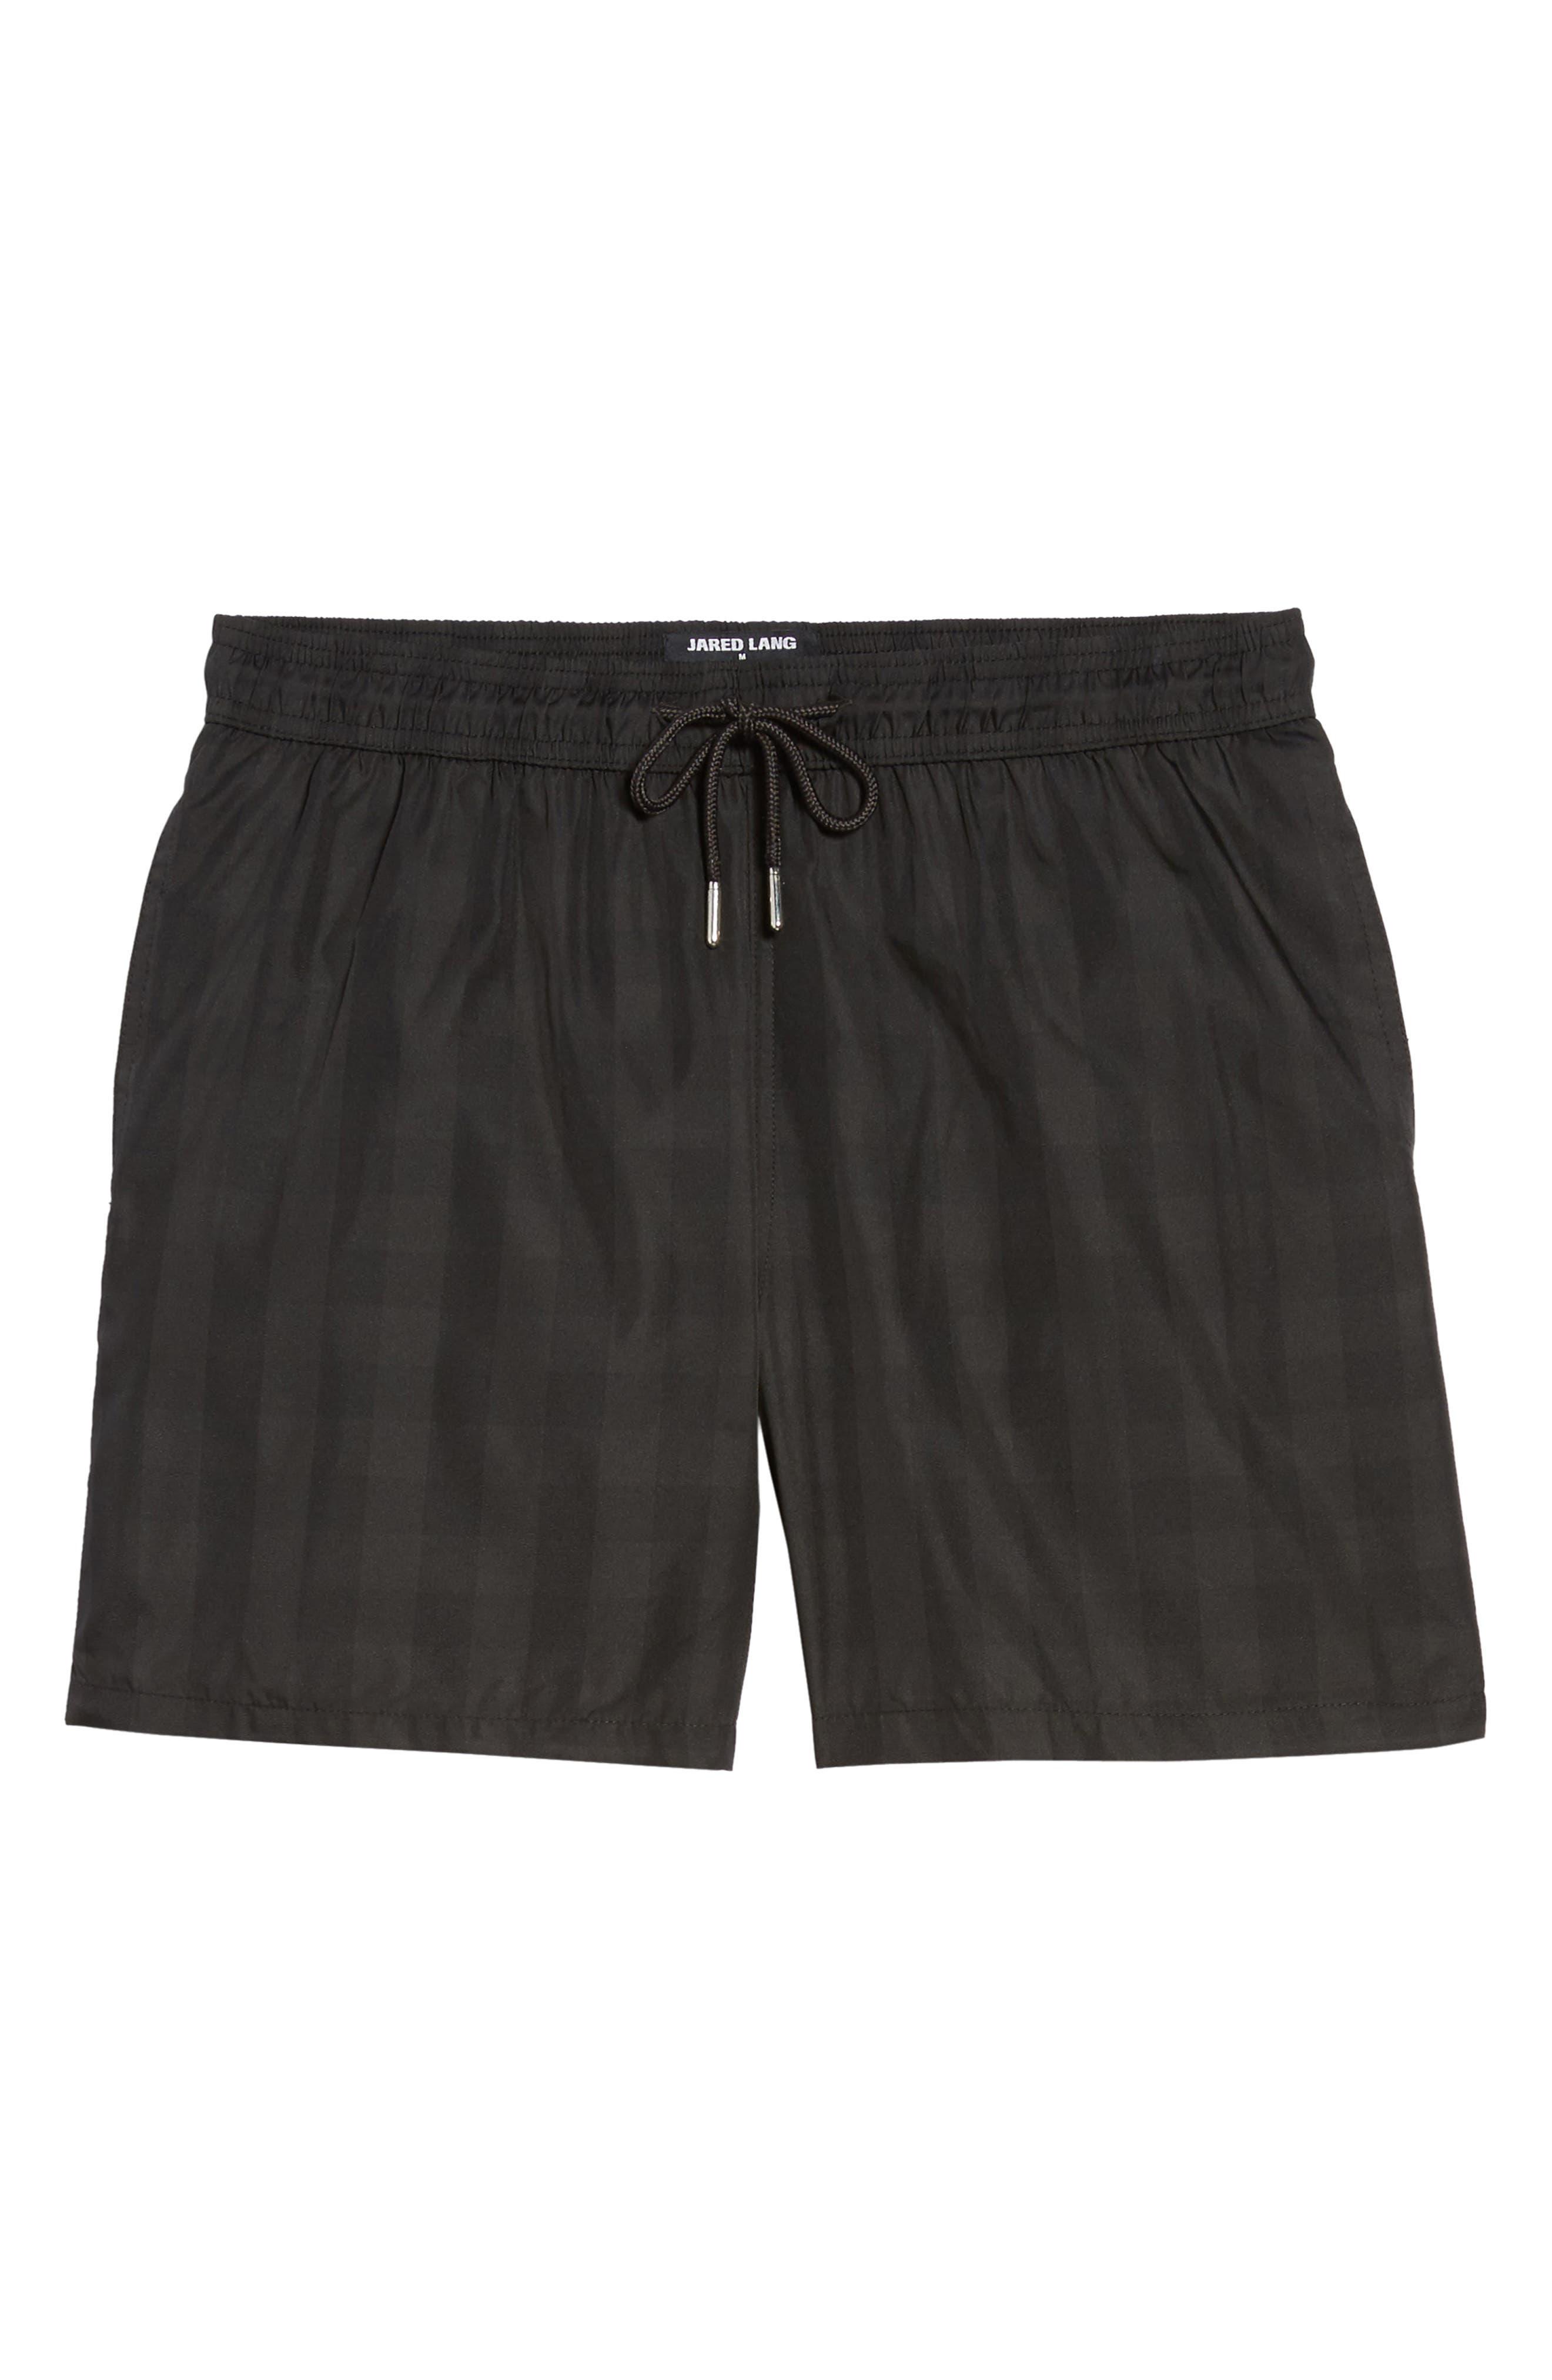 Trim Fit Swim Shorts,                             Alternate thumbnail 6, color,